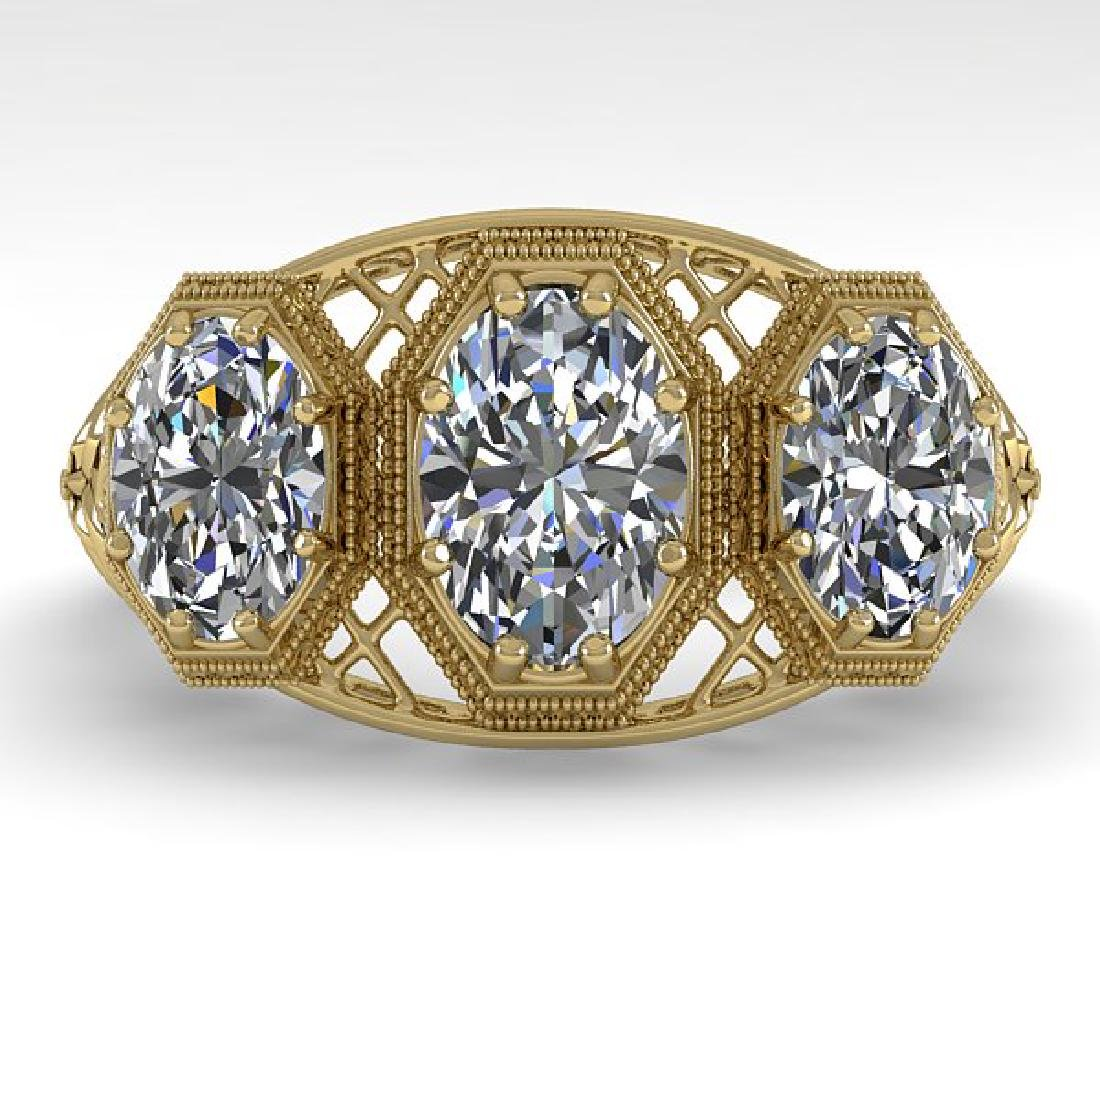 2 CTW VS/SI Oval Cut Diamond Ring 14K Yellow Gold